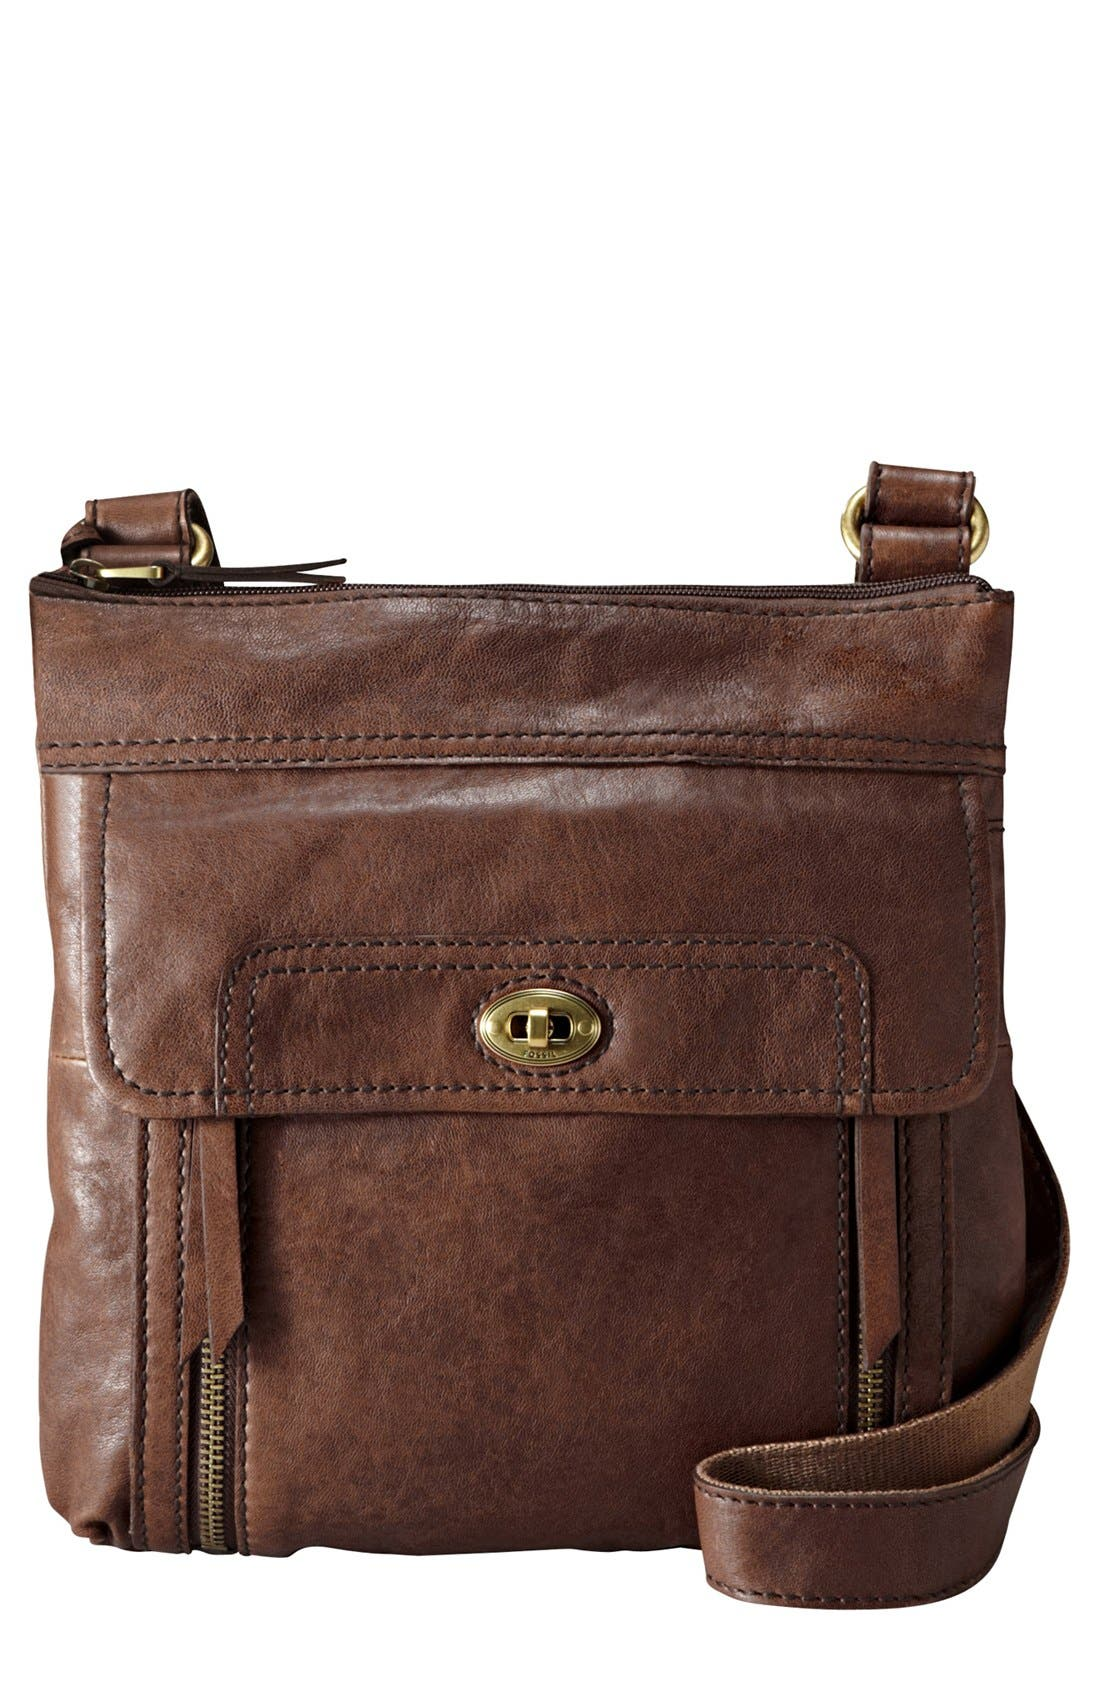 Main Image - Fossil 'Stanton Traveler' Crossbody Bag